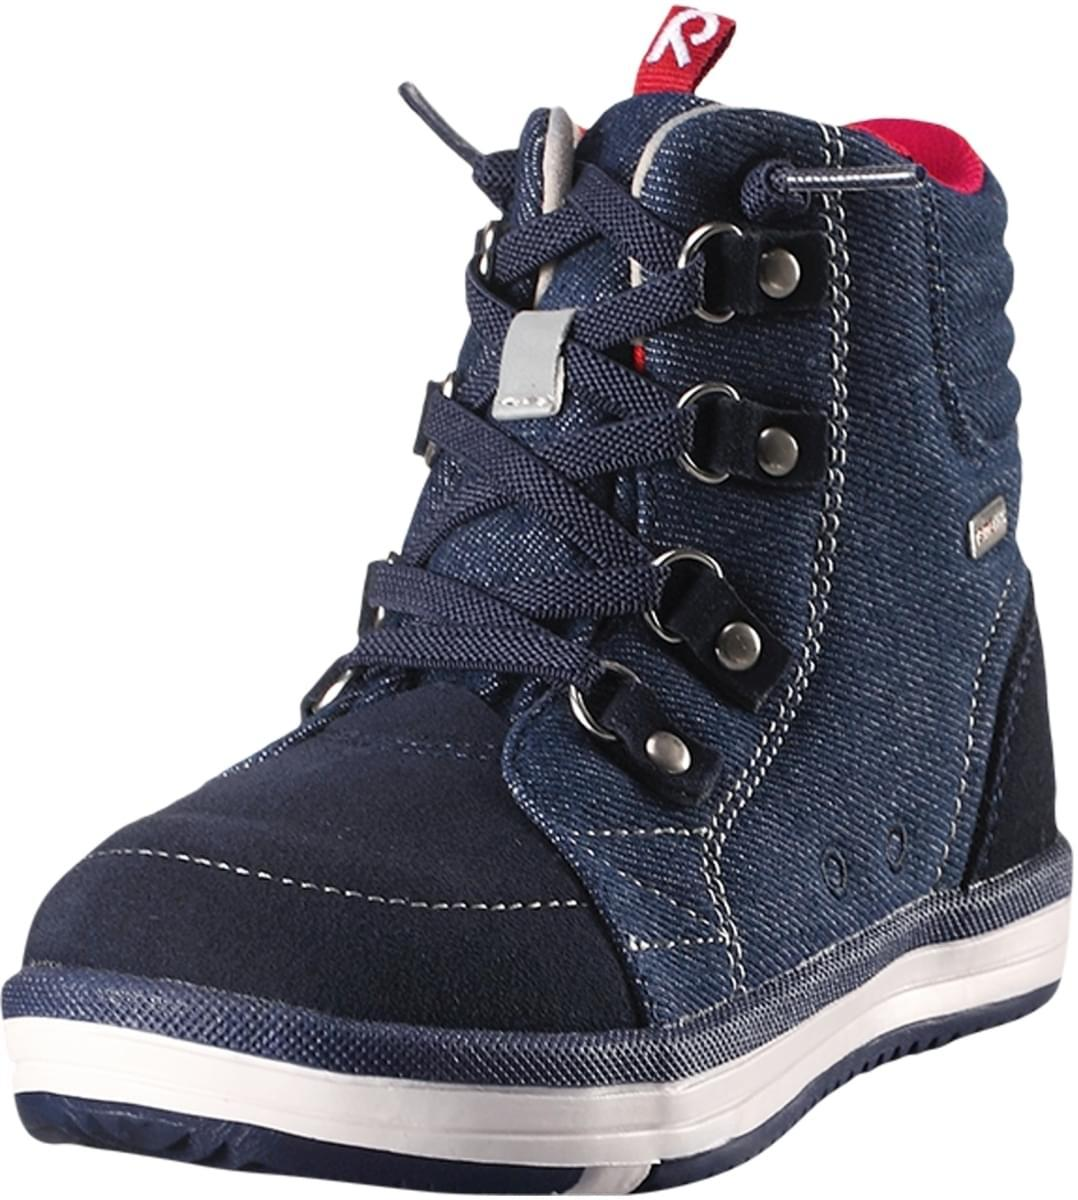 Reima nepremokave zateplene tenisky jeans vzhlad 92b9d9c6f21